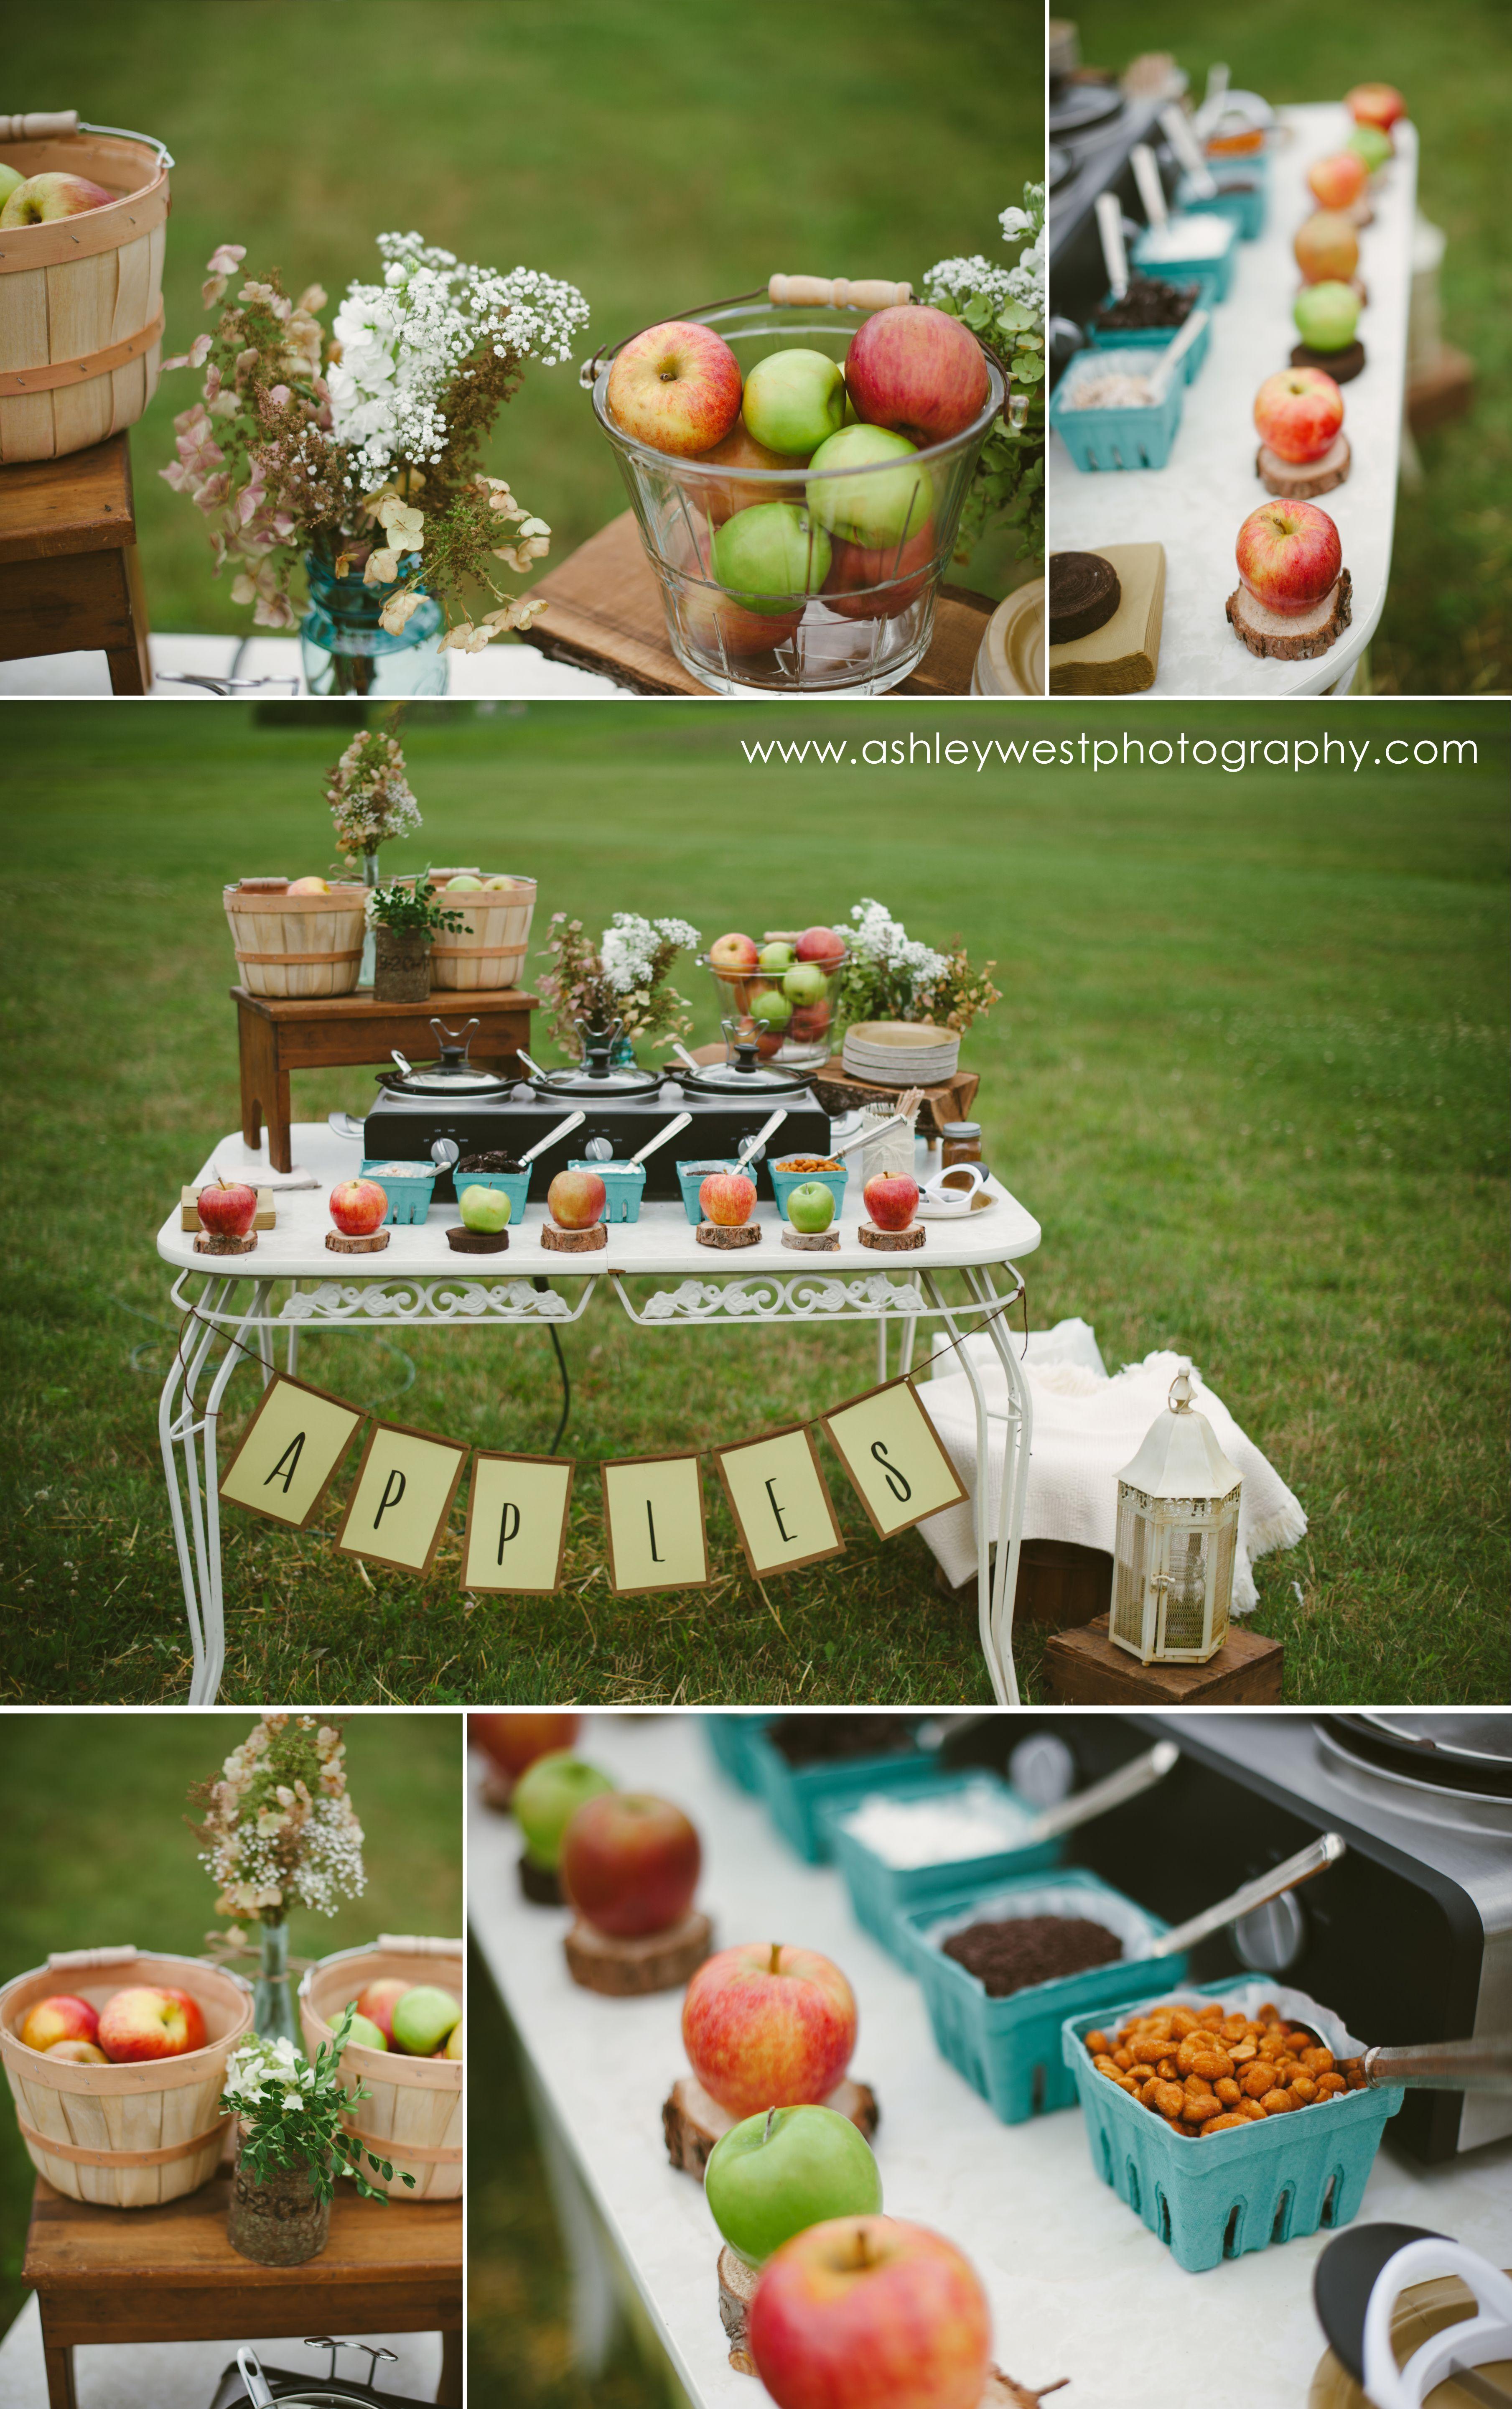 ideas for bridal shower brunch food%0A Carmel Apple Station  Outdoor Backyard Bridal Shower   carmelapples  apples   bridalshower